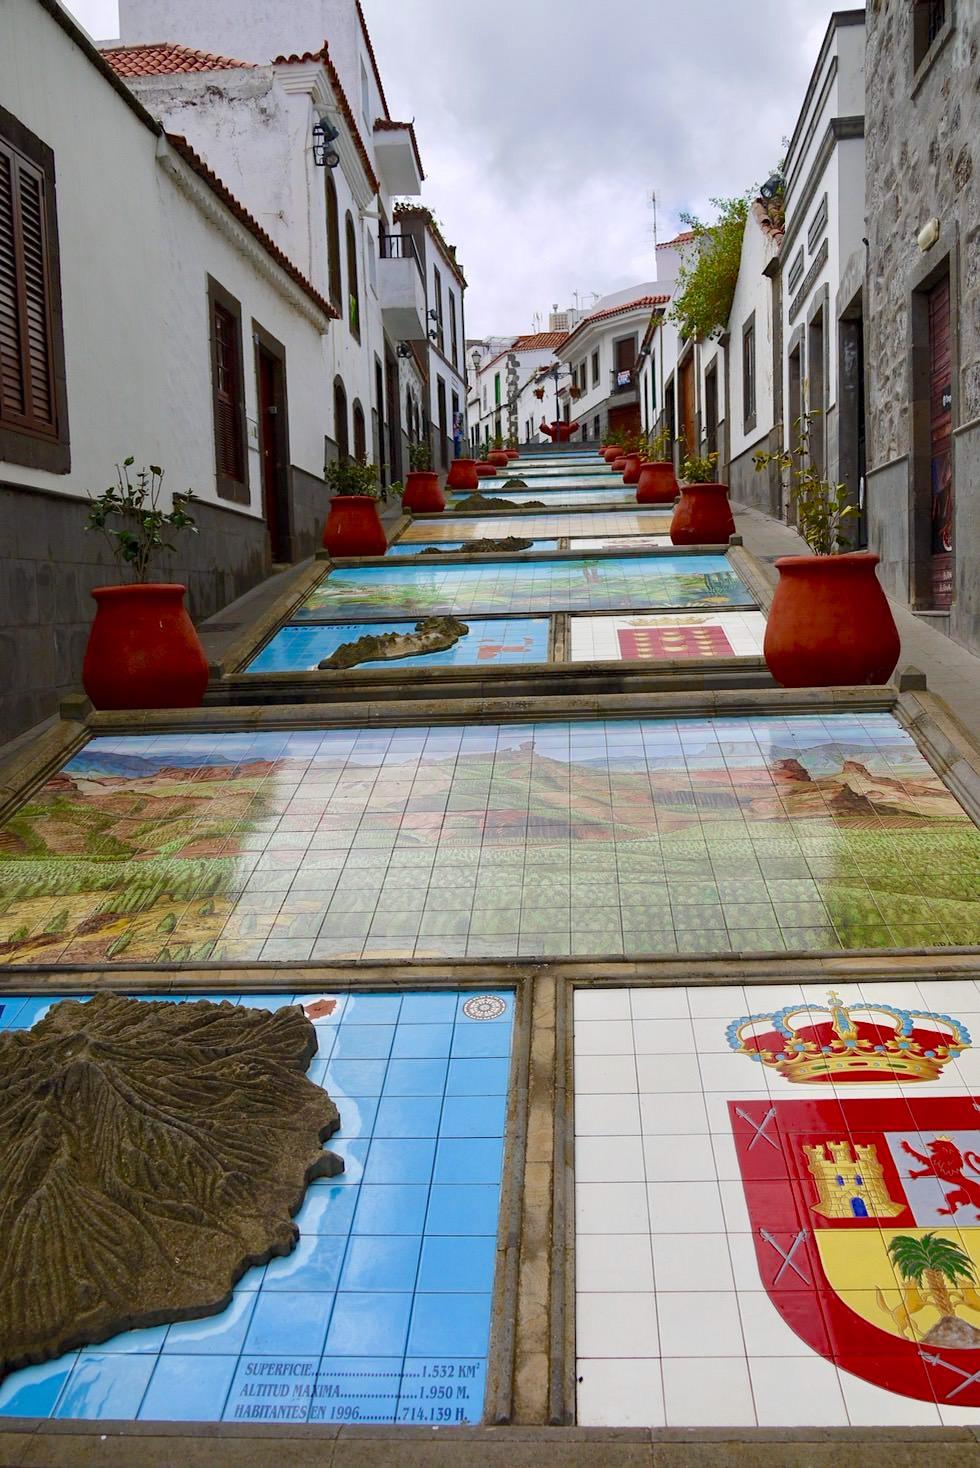 Firgas - Paseo de Canaris: Prachtpromenade mit bunten Kacheln zu allen 7 Kanarischen Inseln - Gran Canaria